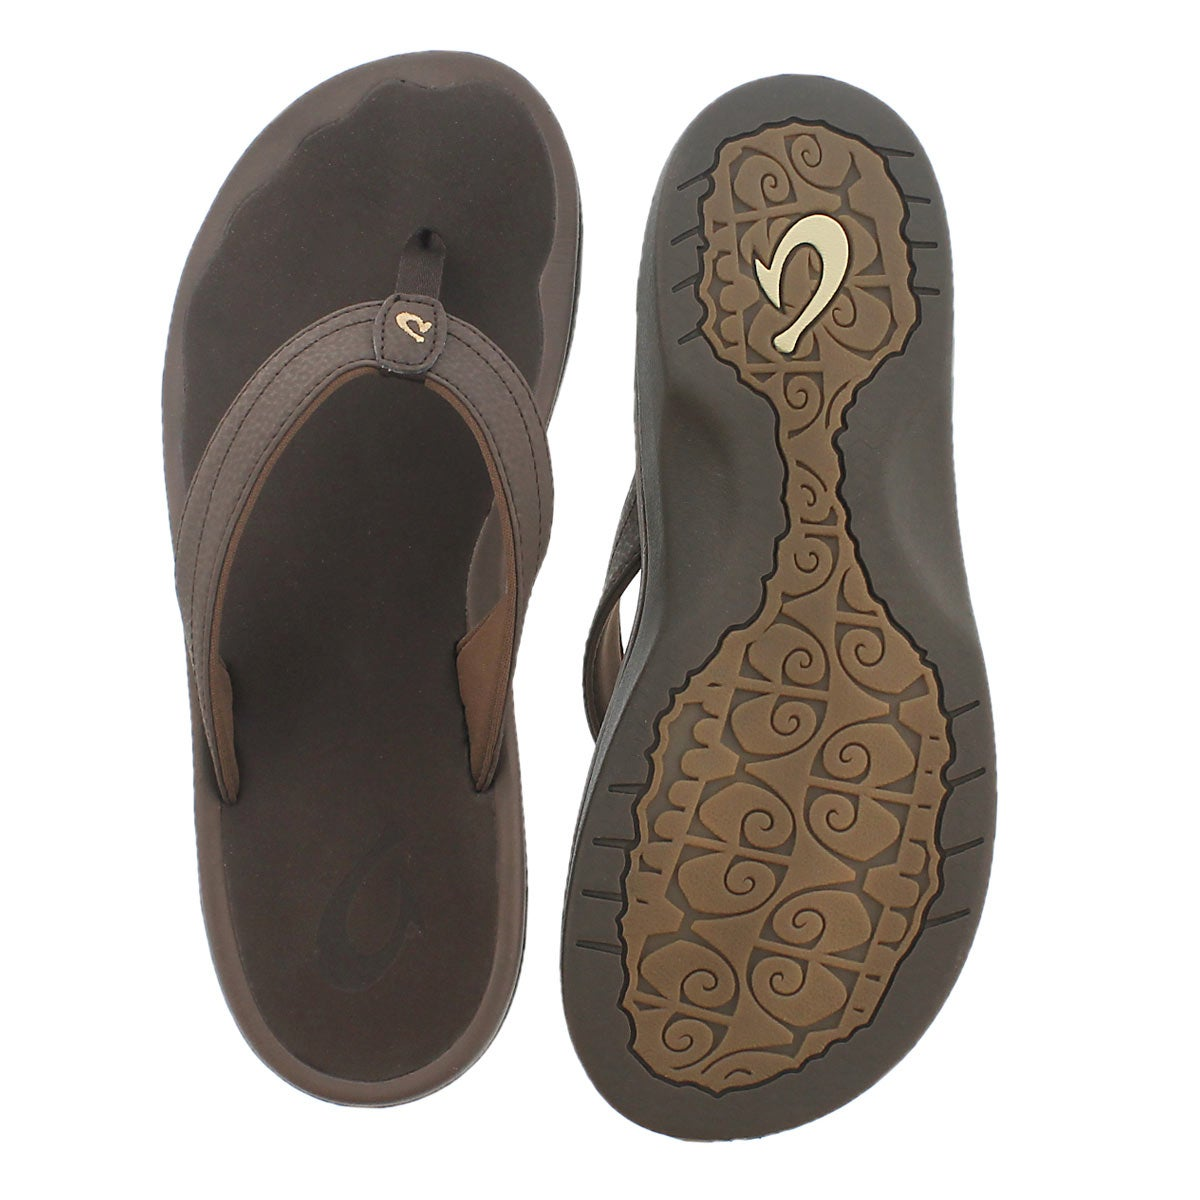 Sandale tong OHANA, java fonc�, femmes